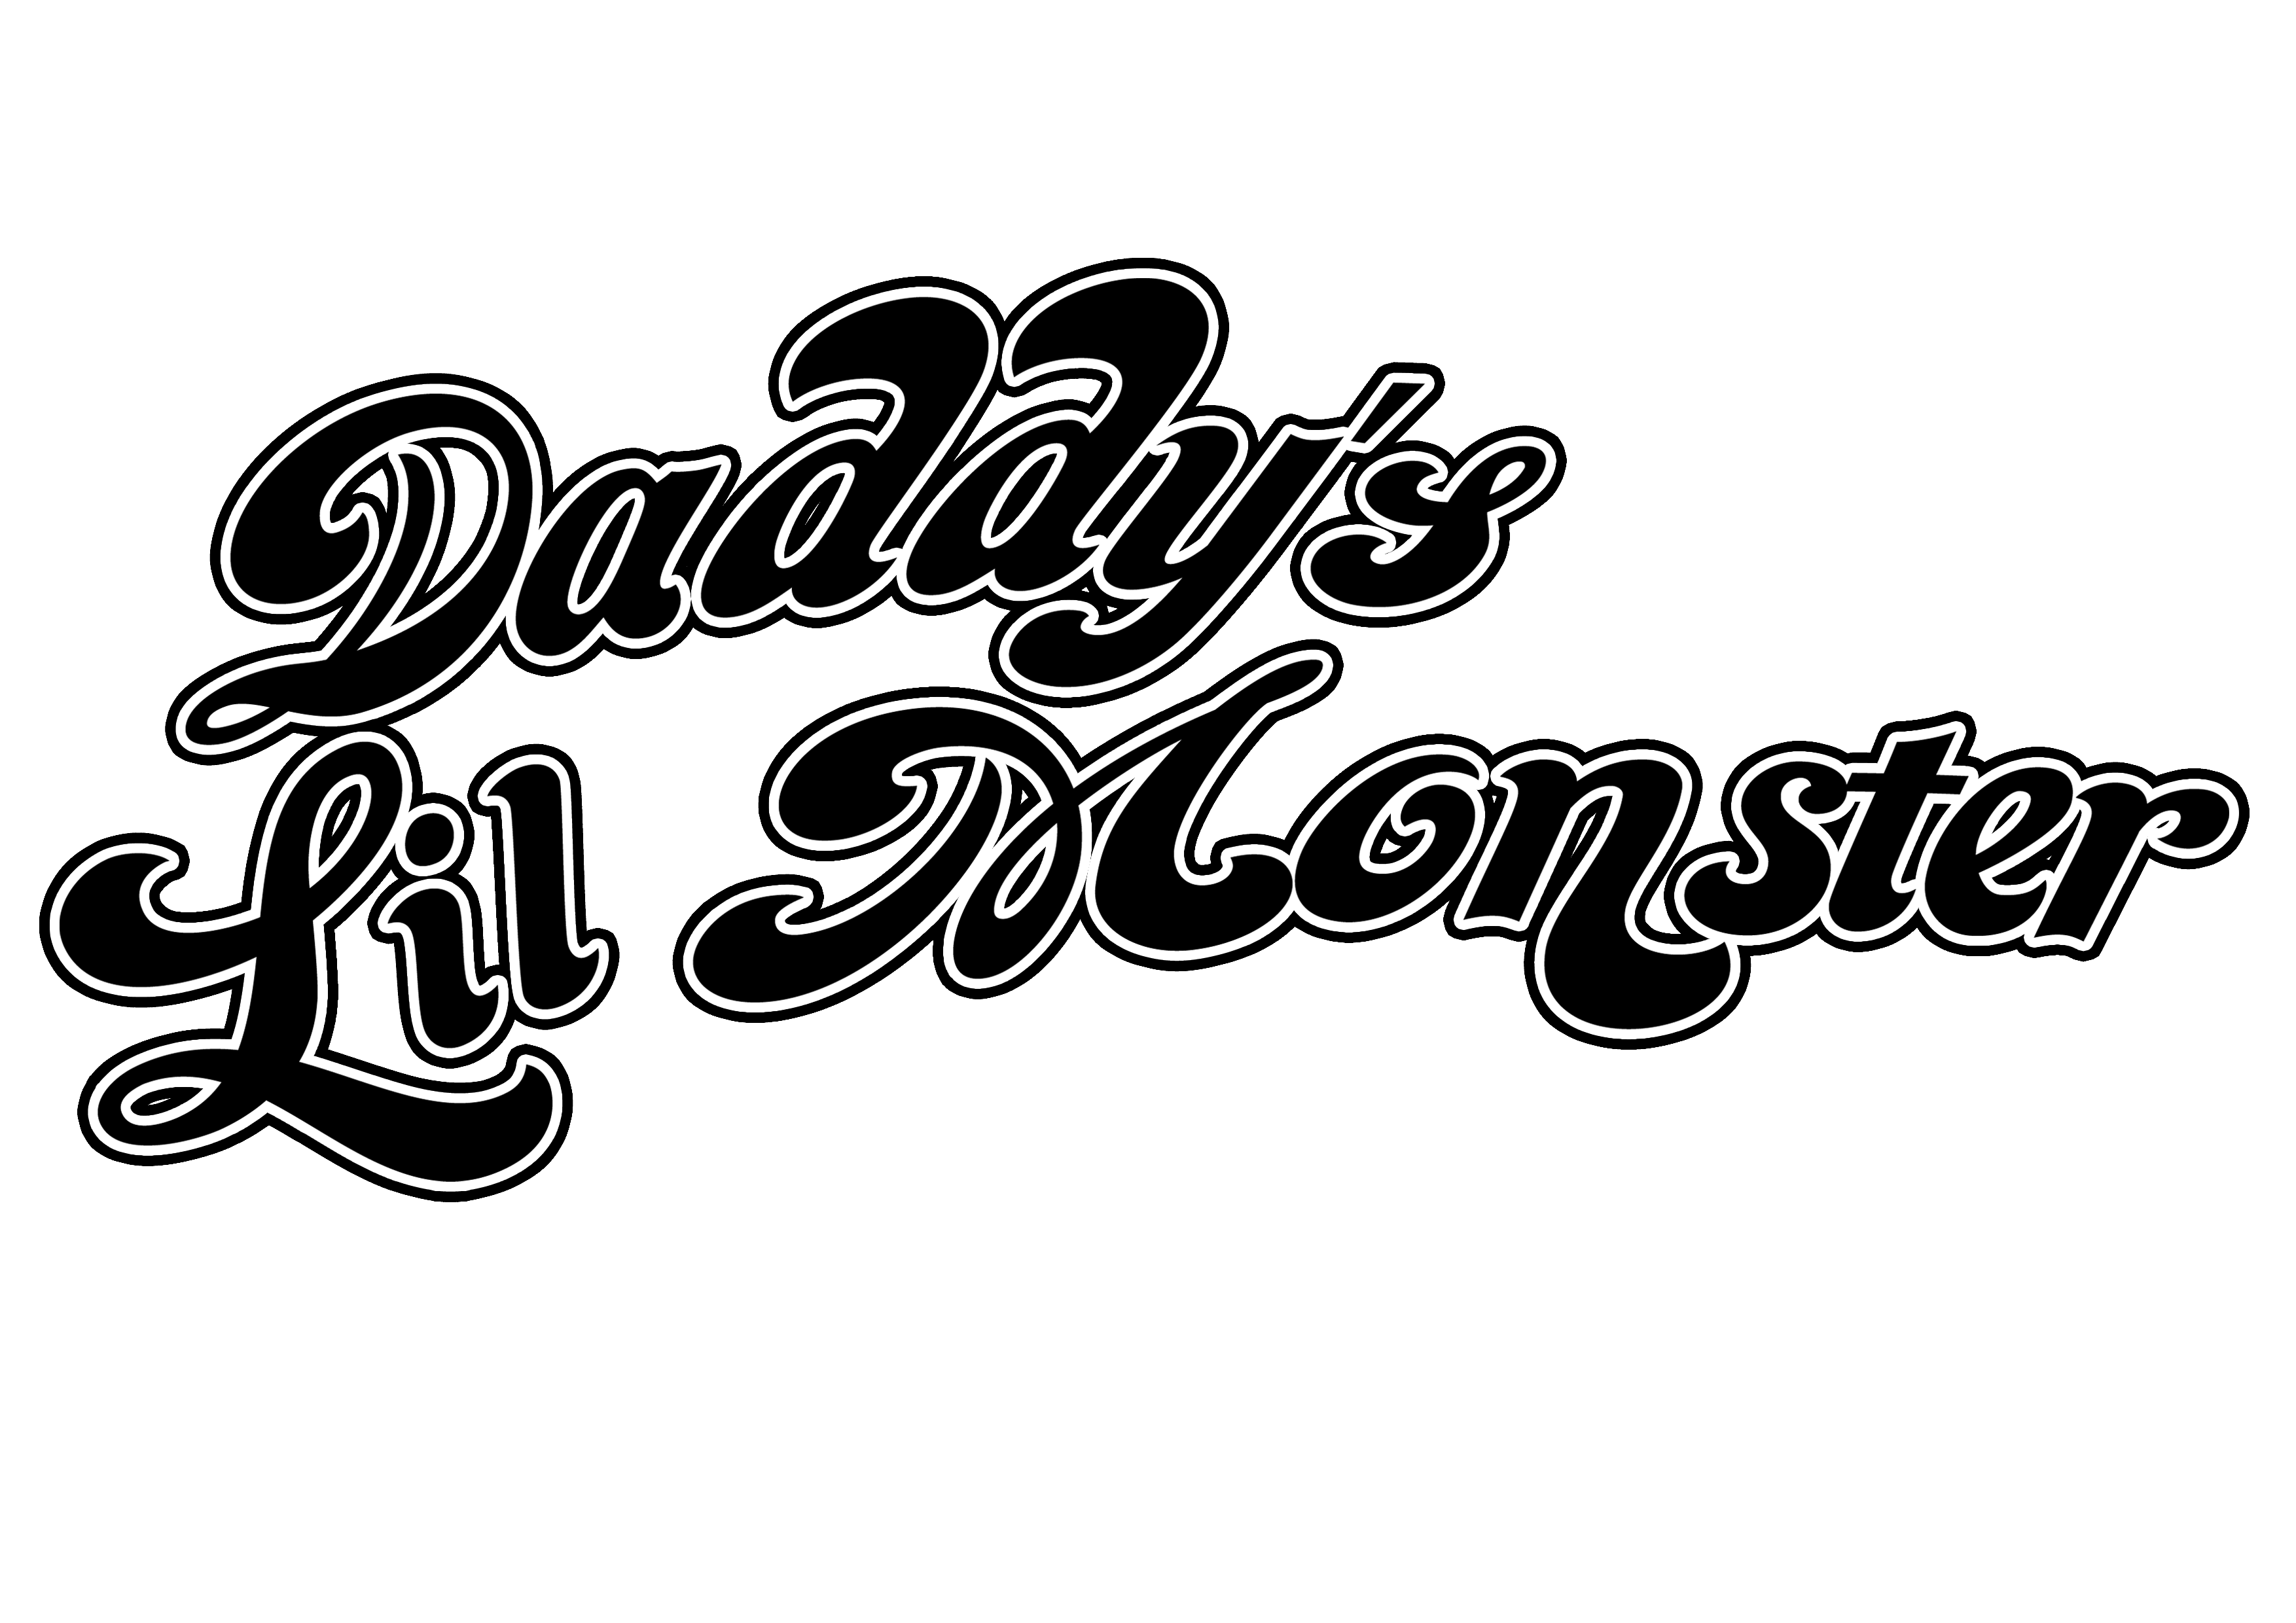 Daddyu0027s Lil Monster.png; 3508 x 2480 PlusPng.com  - Lil Monster PNG